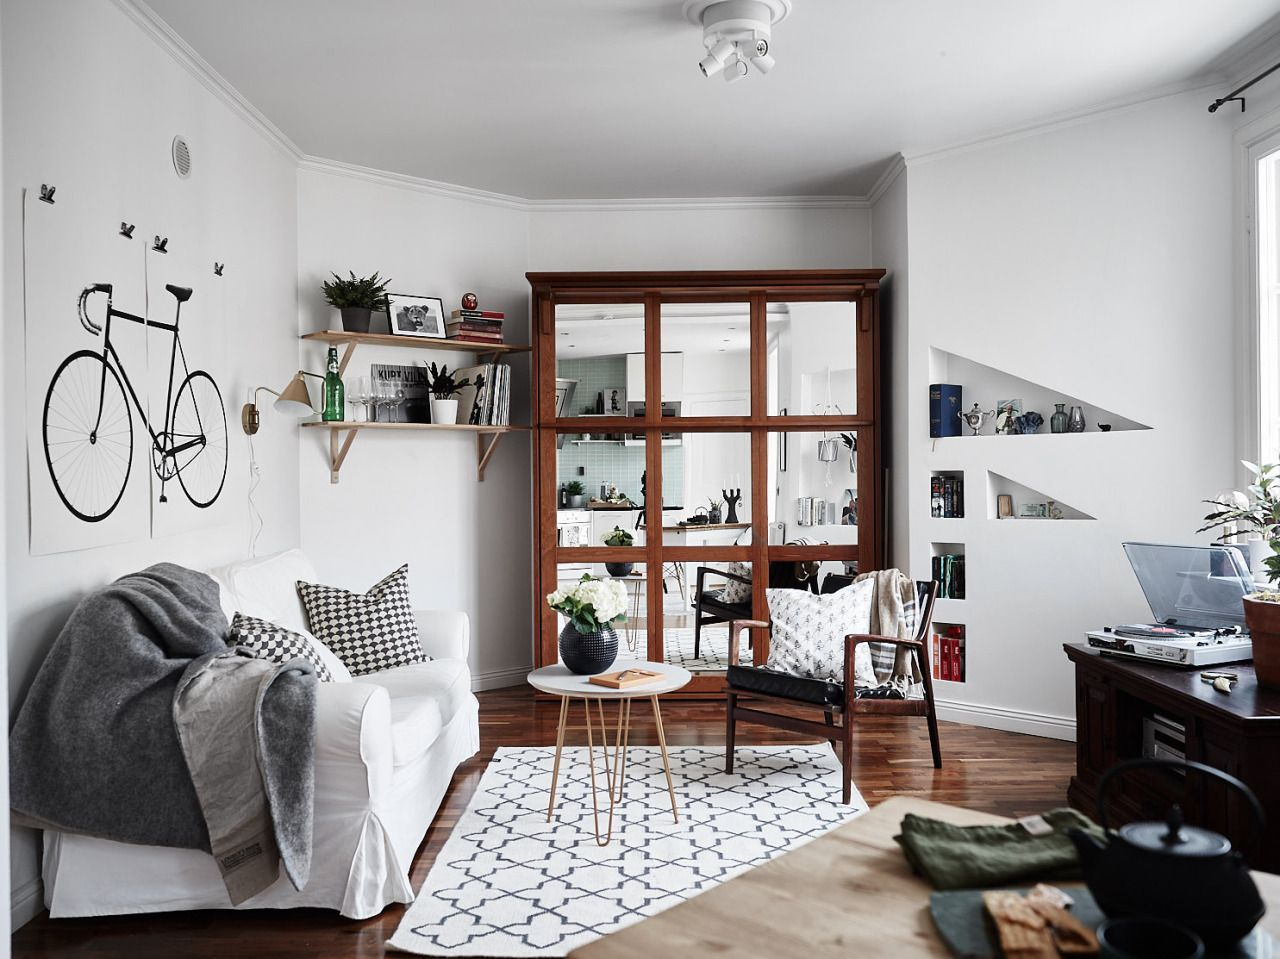 Studio apartment Follow Gravity Home Blog Instagram